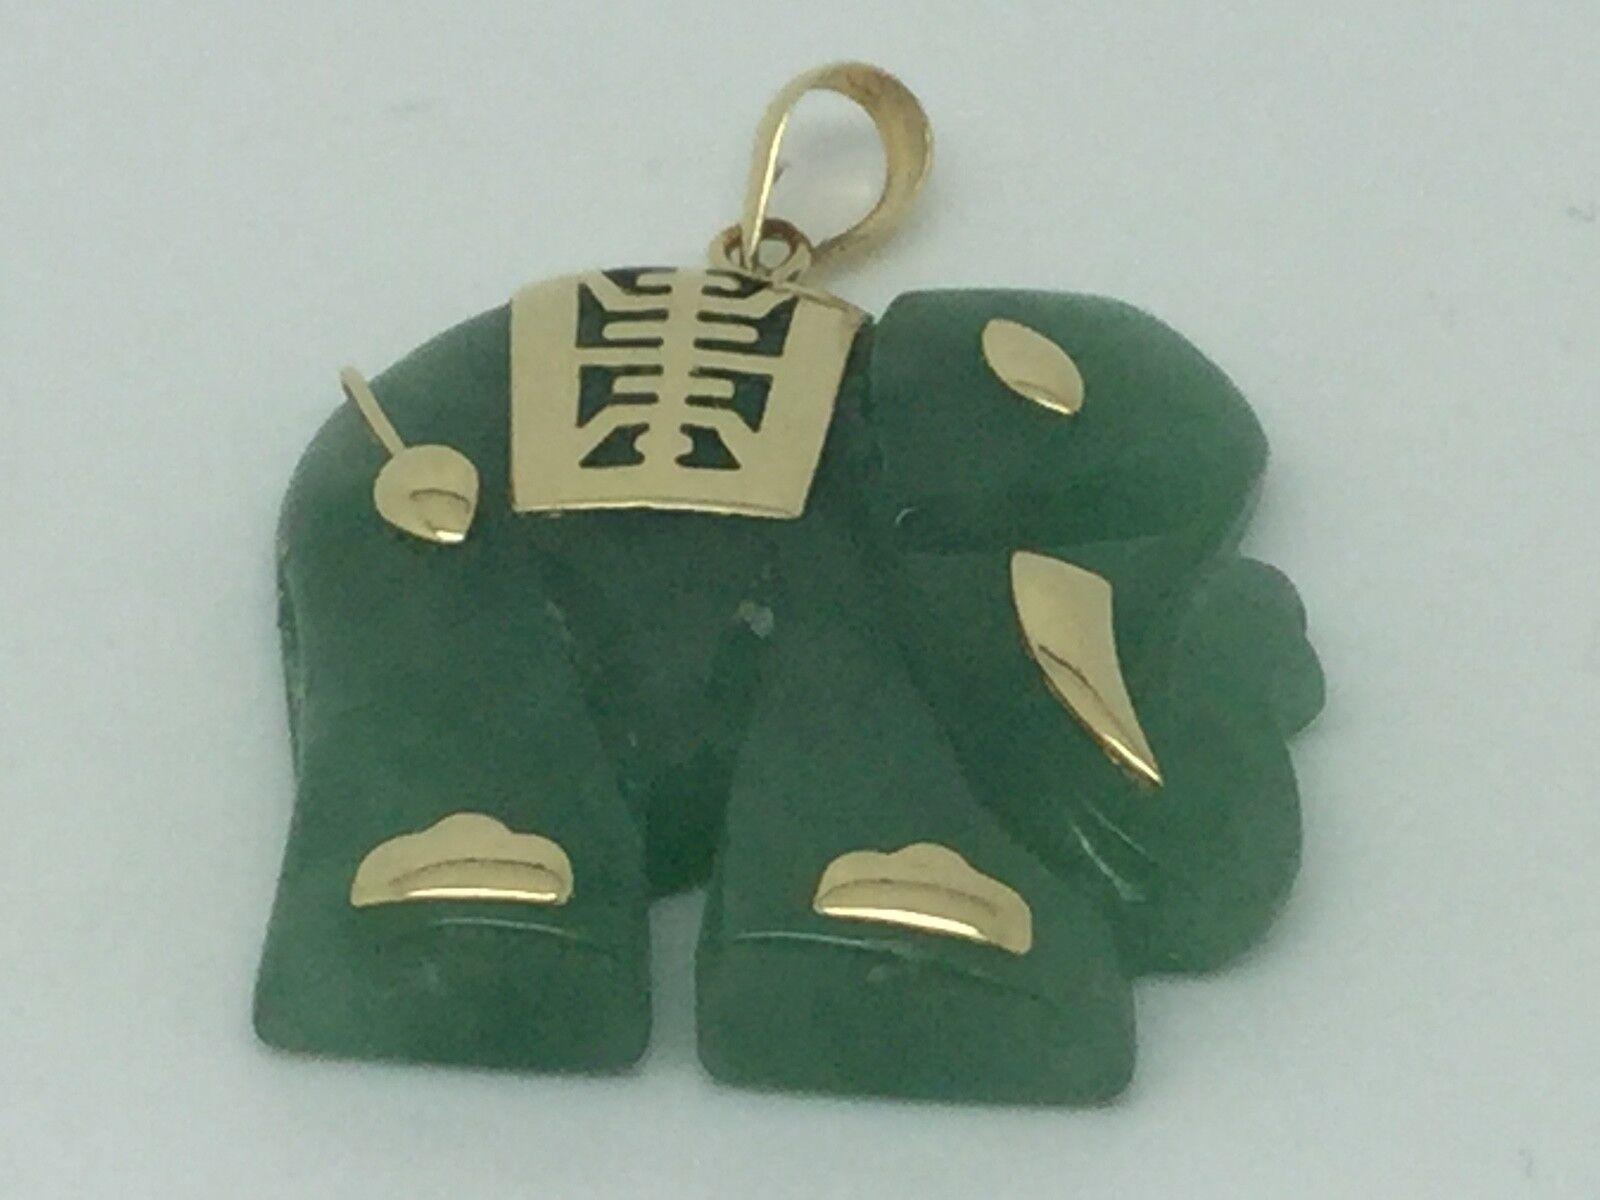 Genuine Green Jade pendant with 14k YG - Elephant   25mmx25mm